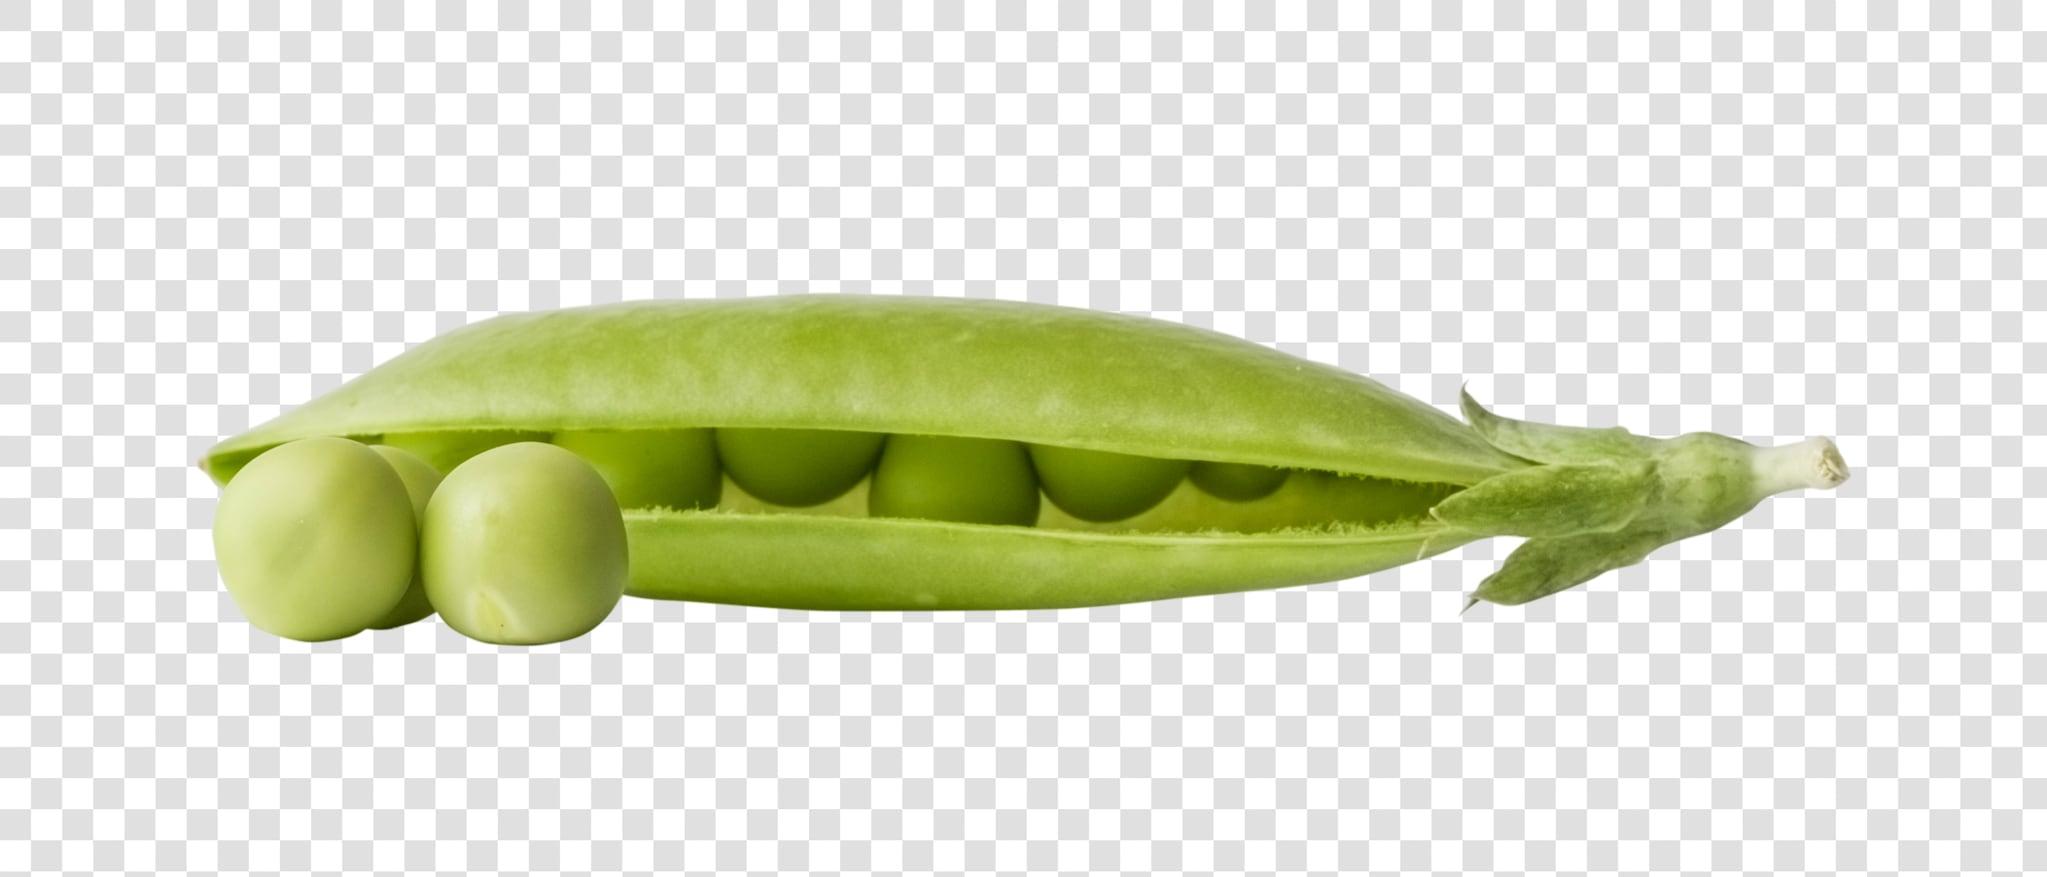 Green pea PSD layered image